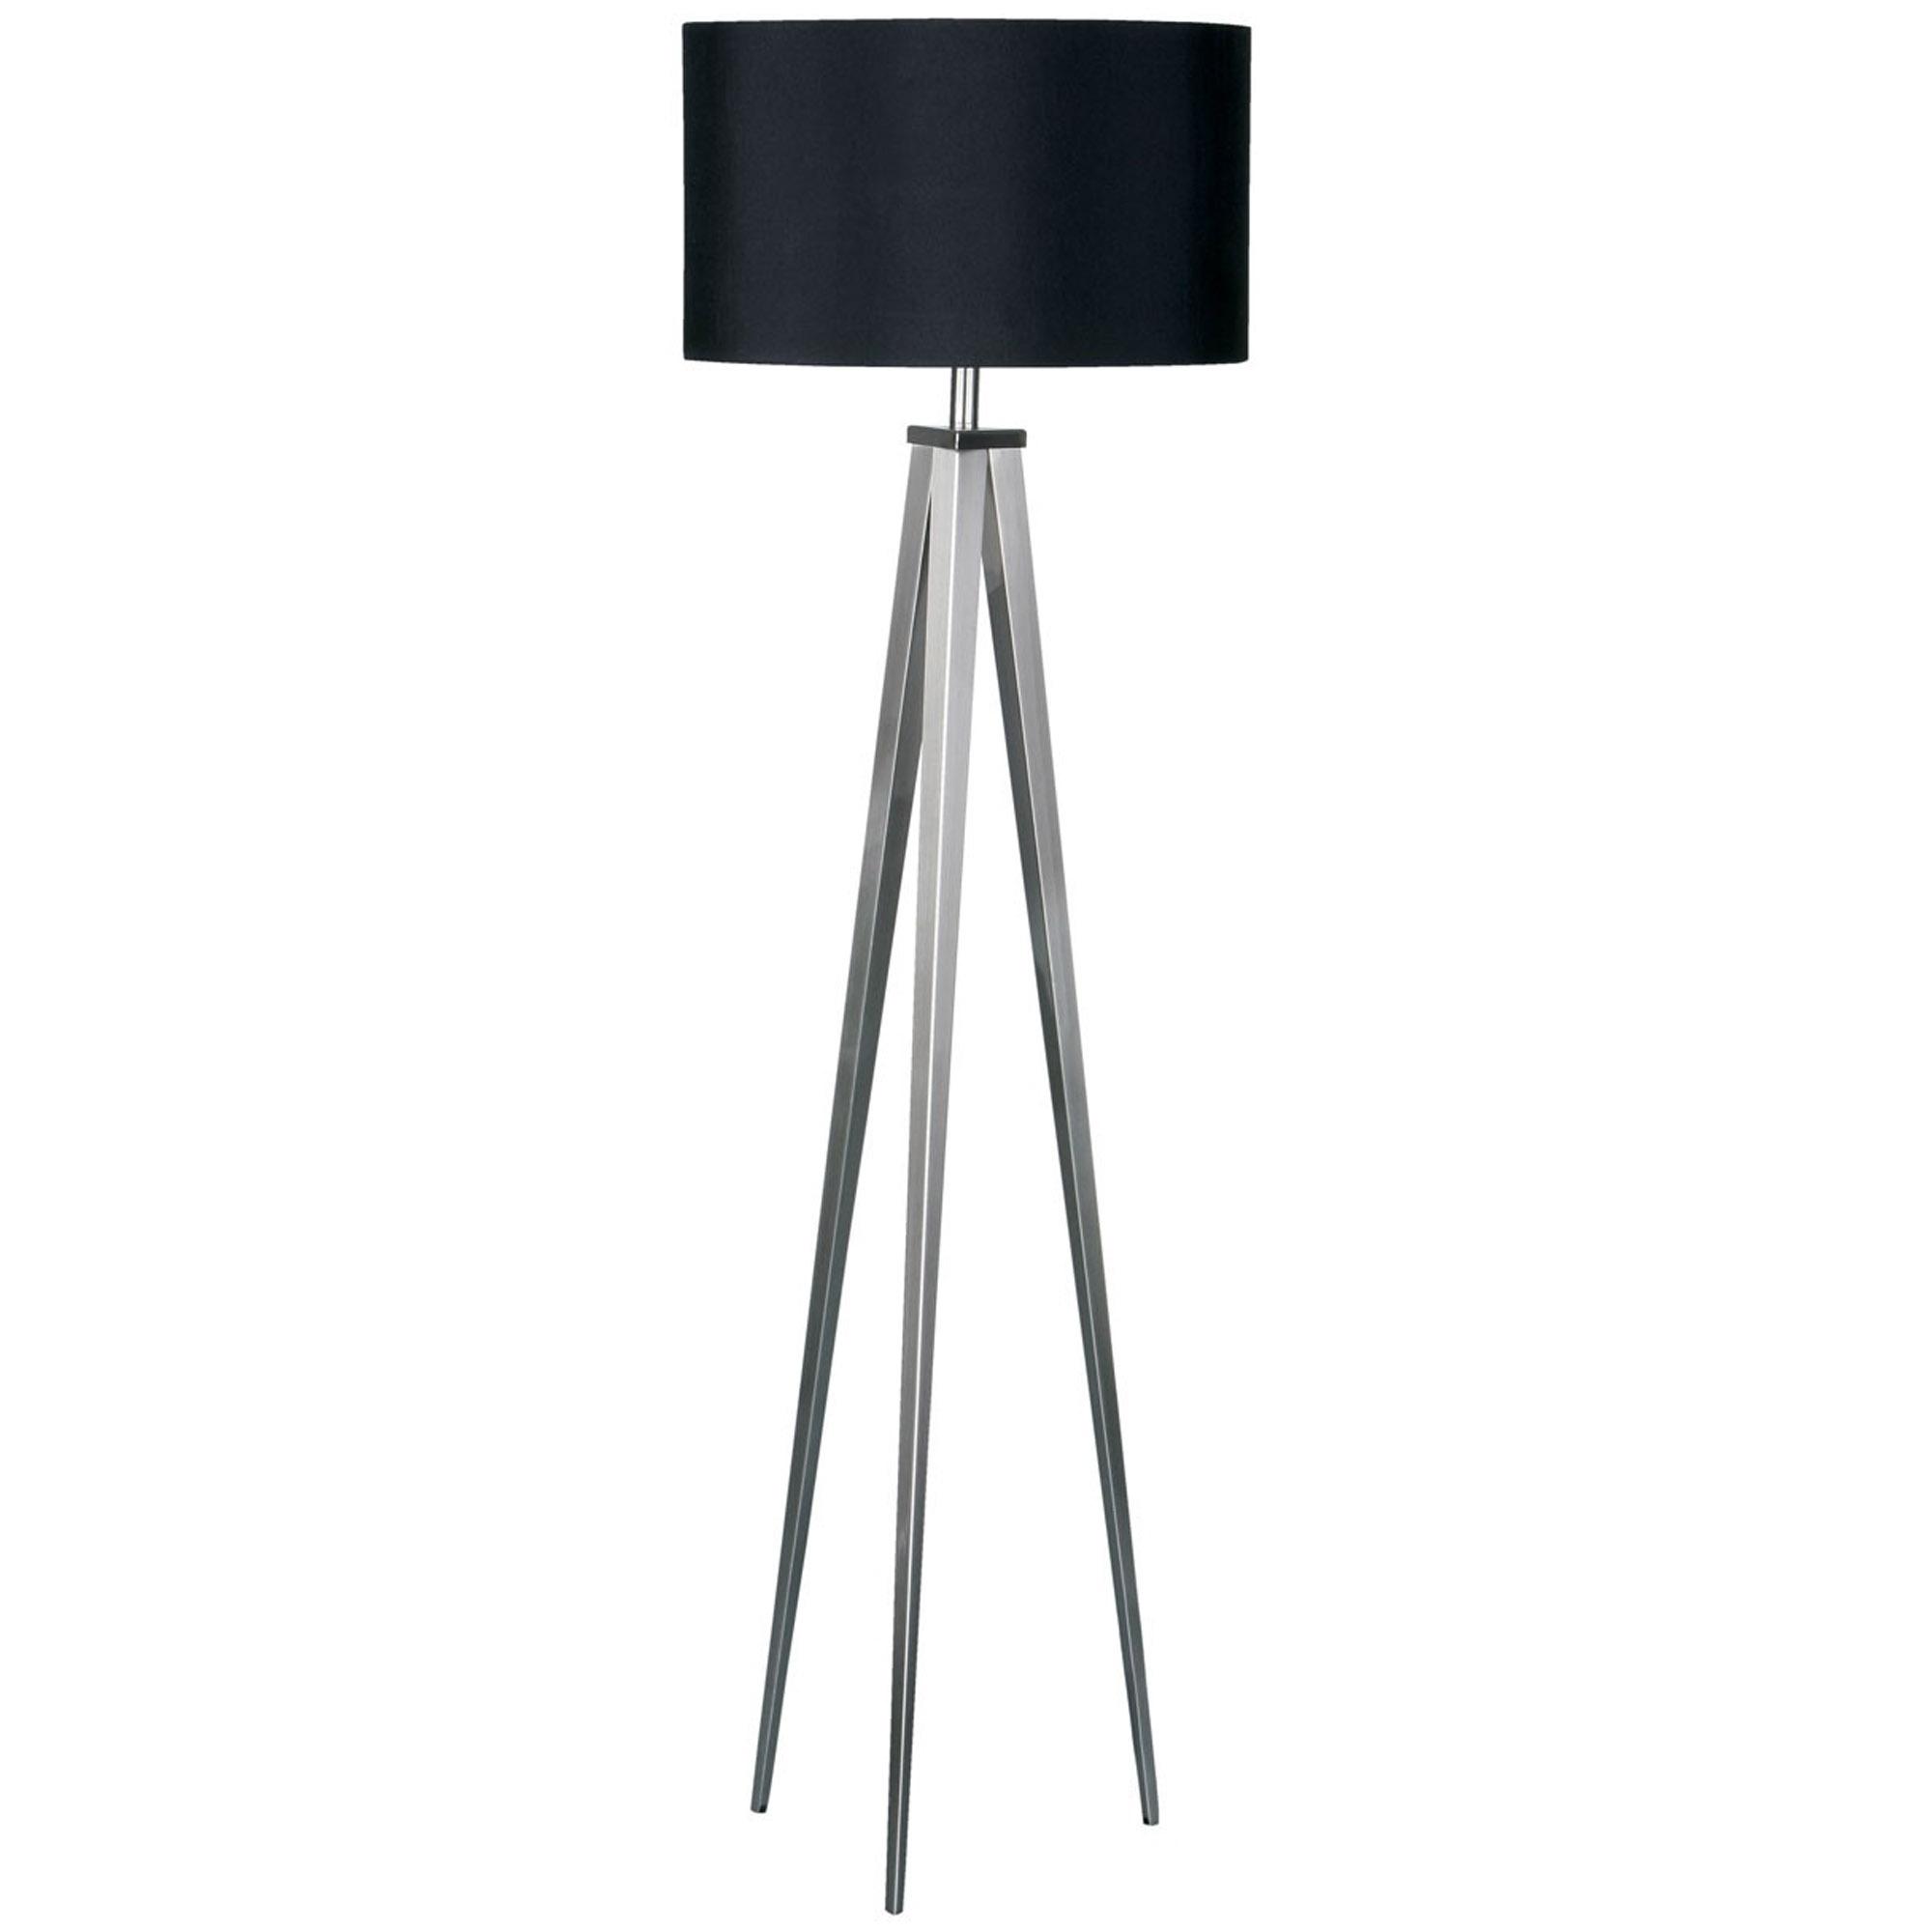 Black Tripod Floor Lamp Modern Contemporary Lighting